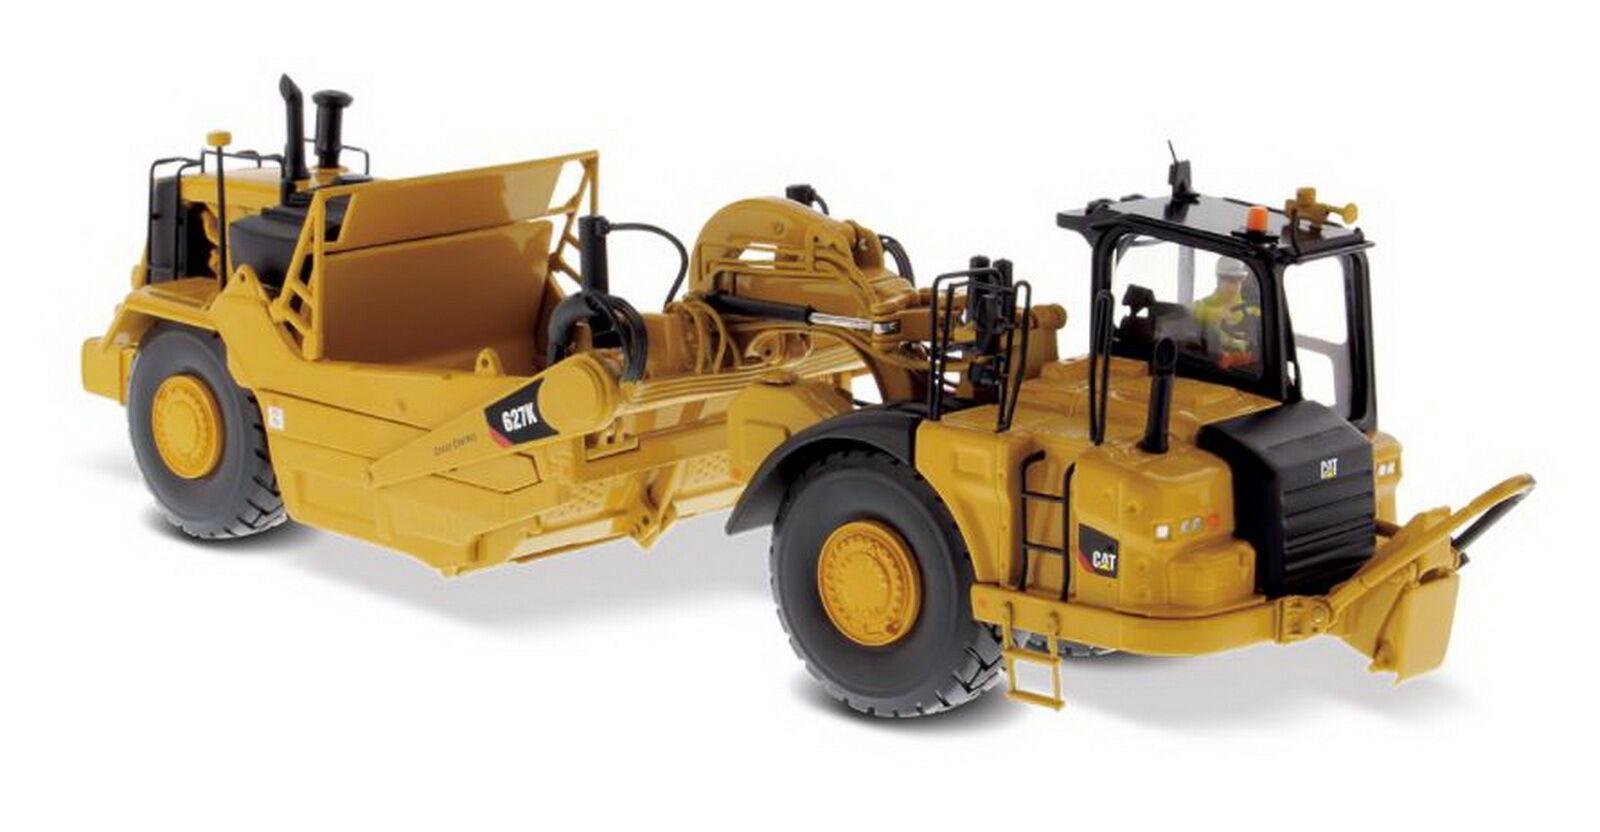 1/50 dm Caterpillar Cat 627K Tractor de ruedas-Raspador Diecast Modelo 85921